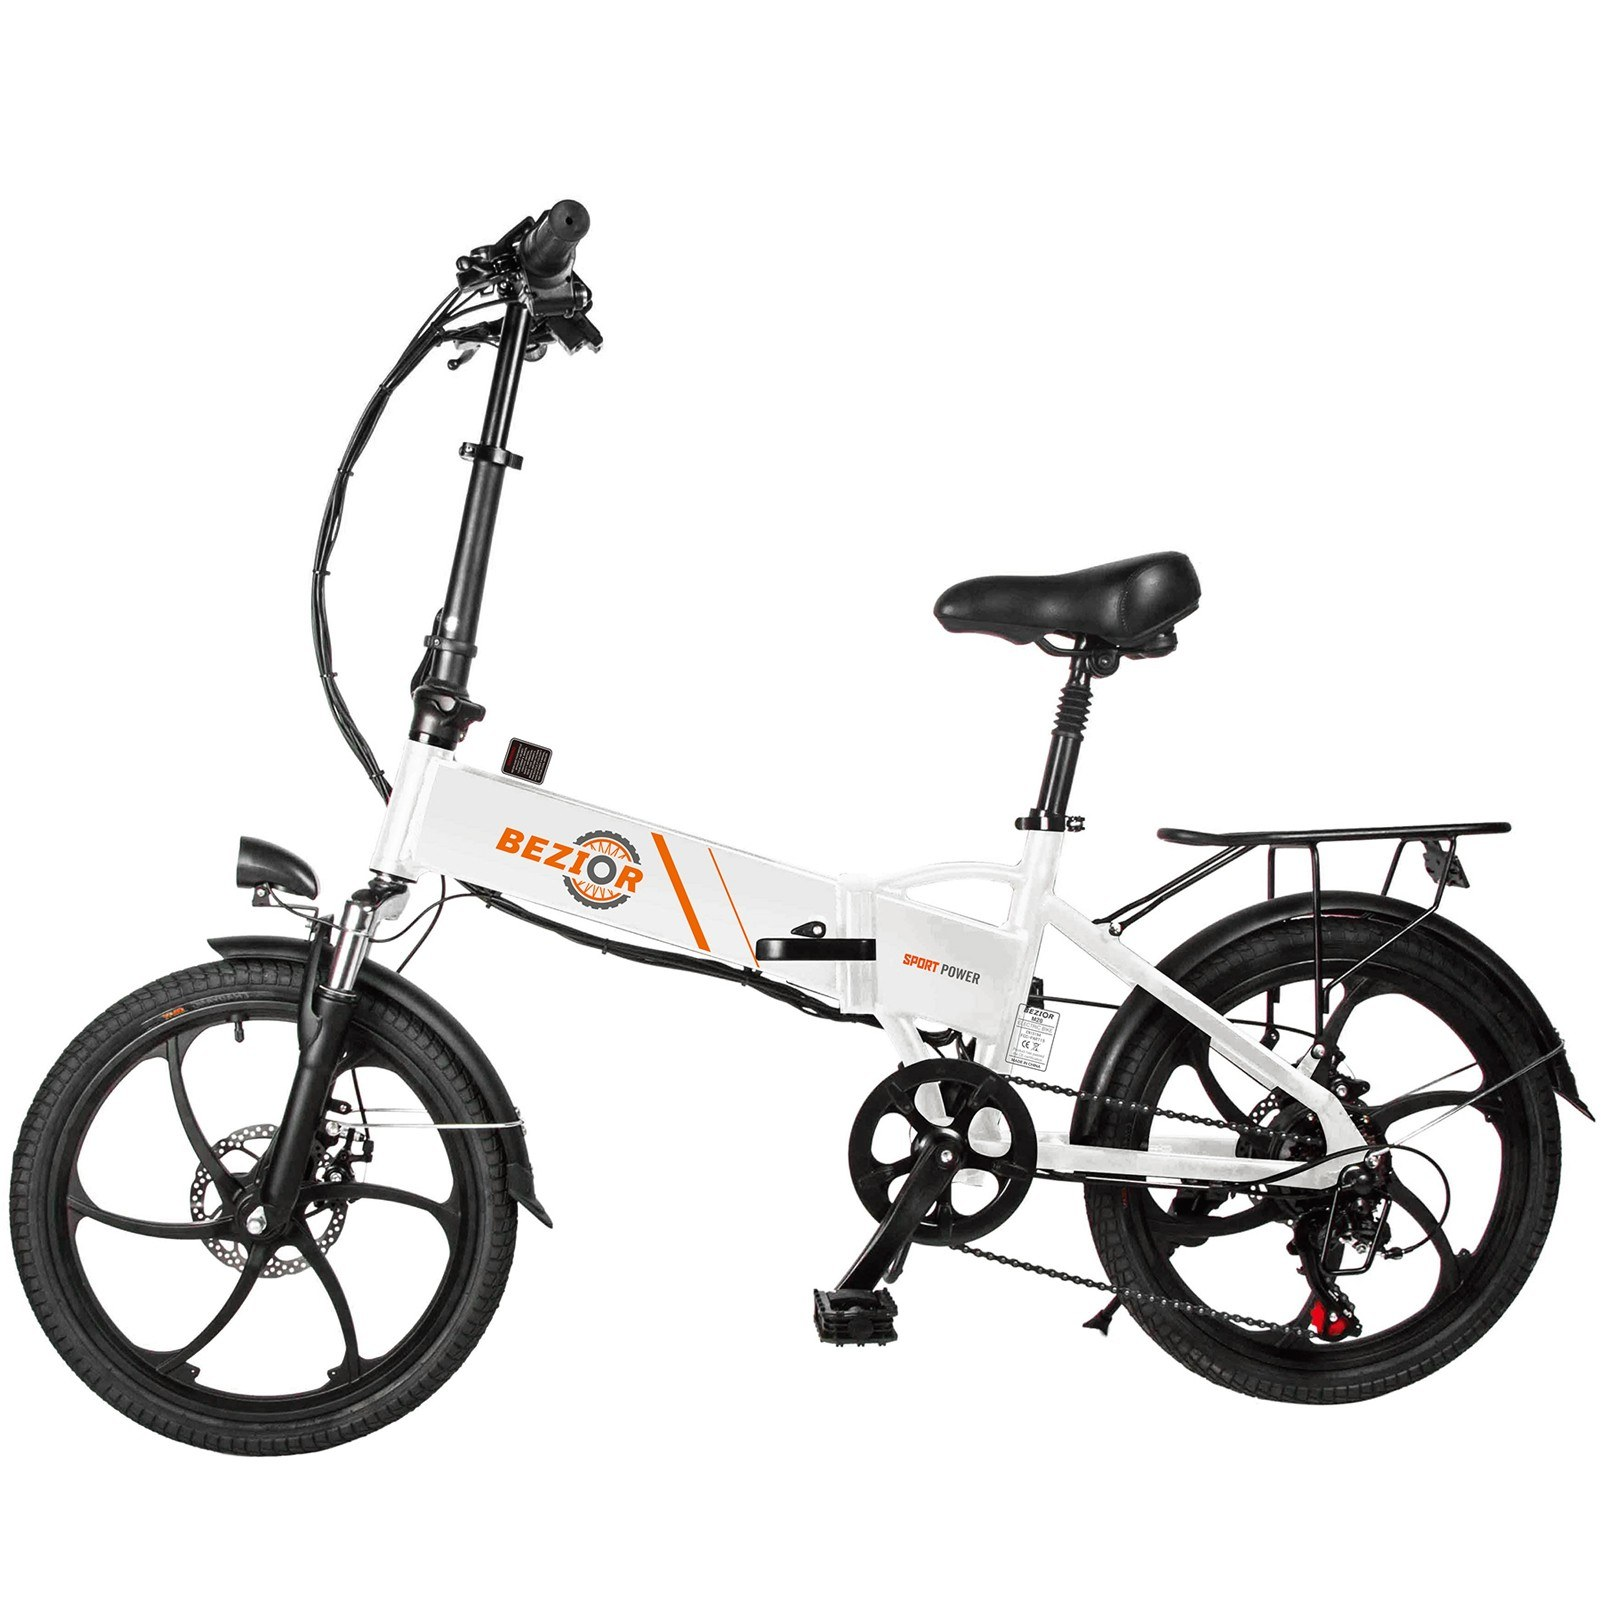 cafago.com - 16% OFF BEZIOR M20 350W 20 Inch Folding Power Assist Electric Bike,free shipping+$825.23